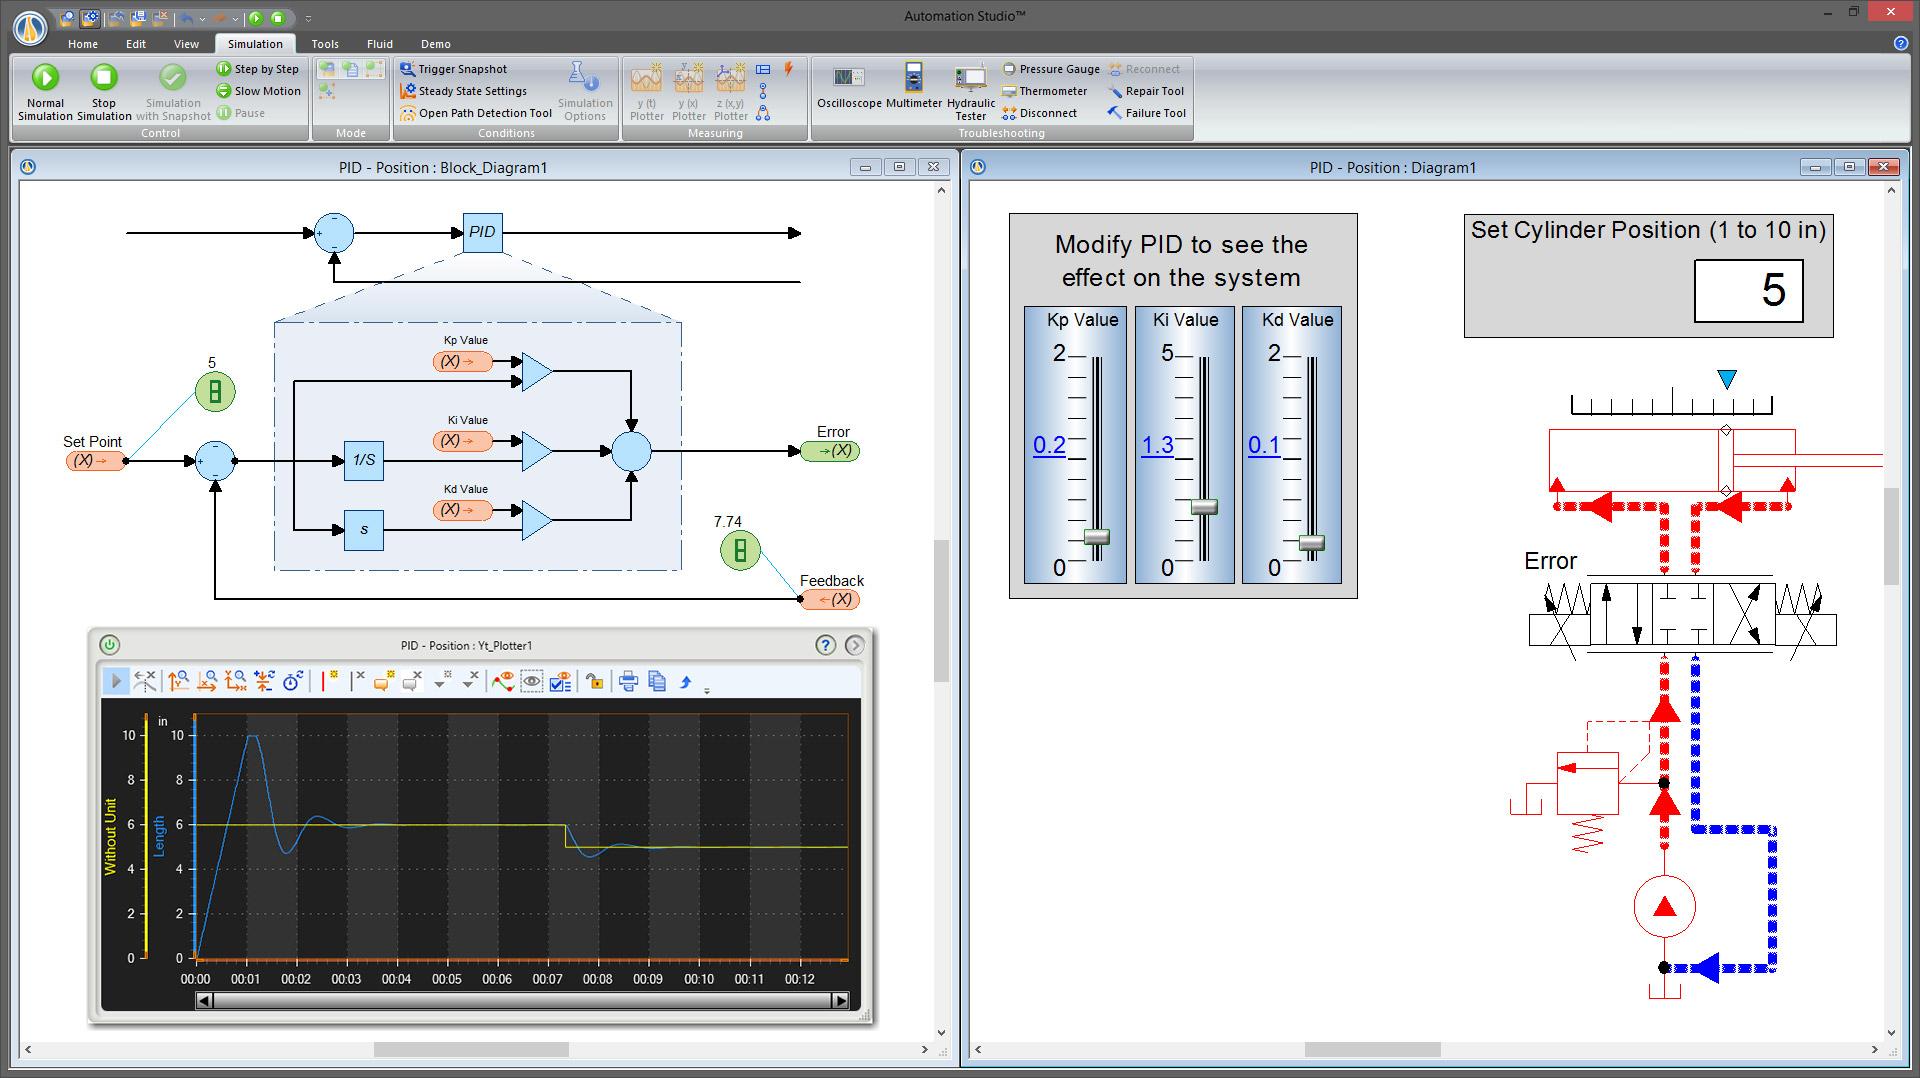 Diagram In Math Famic Technologies Inc Automation Studio Professional Edition